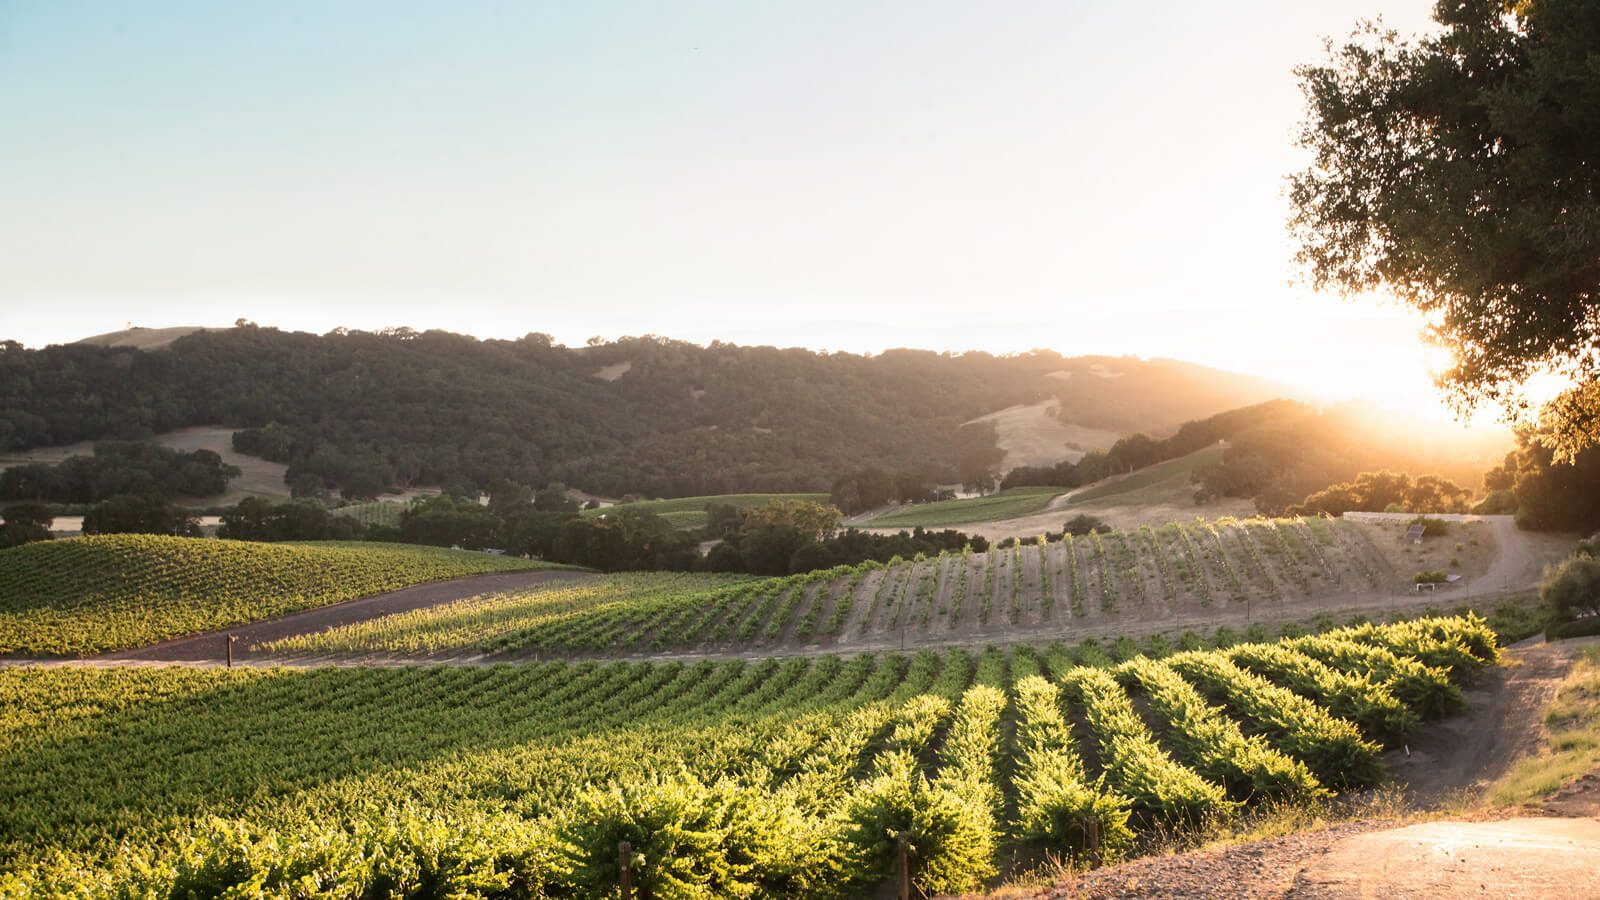 Soundless video of the Grosso Kresser vineyard in the golden, morning light.